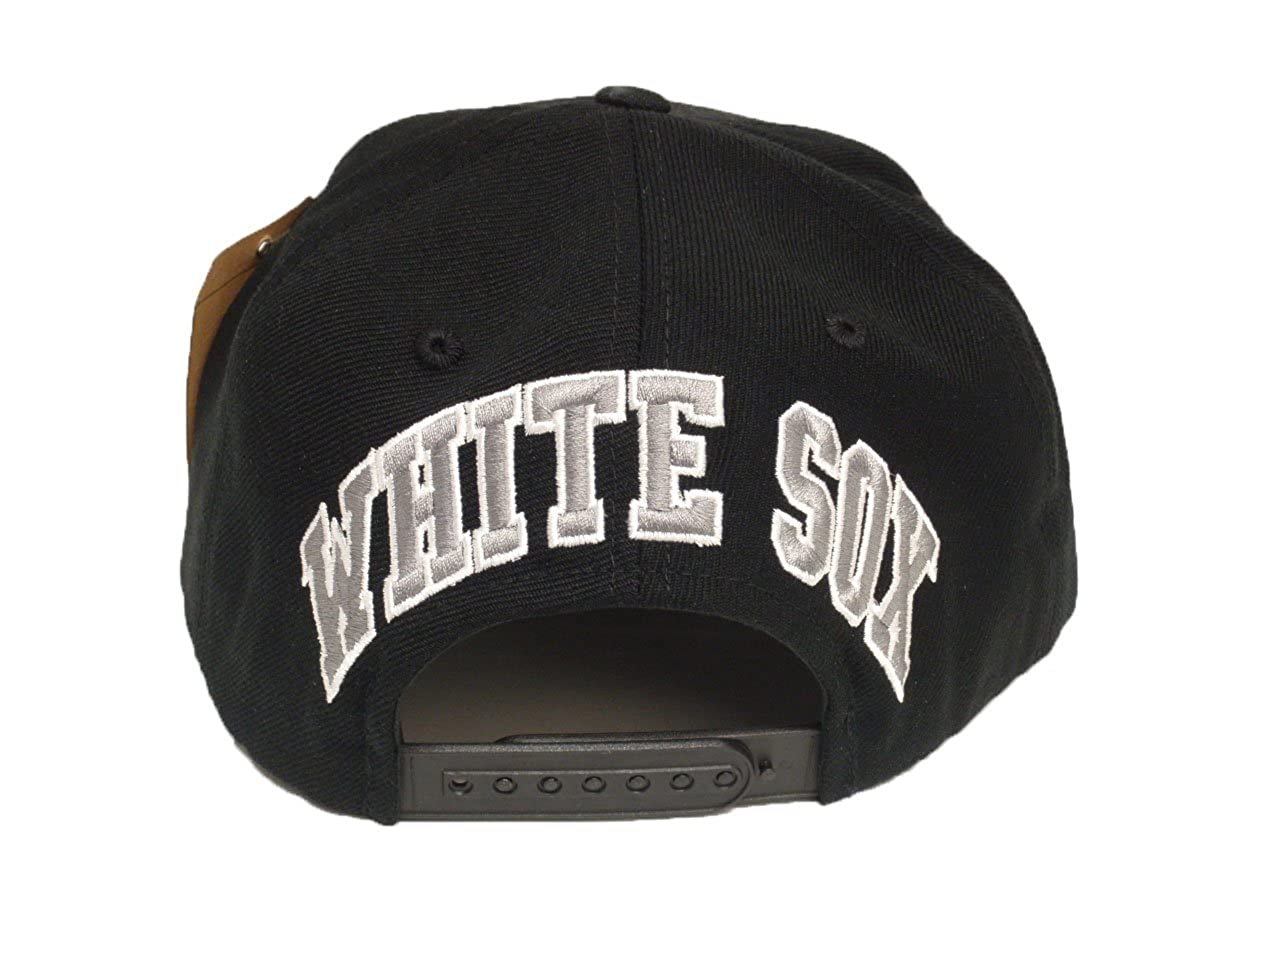 53cbfc1700e8e 2 Pac Chicago White Sox Snapback Cap American Needle Hat MLB Baseball   Amazon.ca  Clothing   Accessories